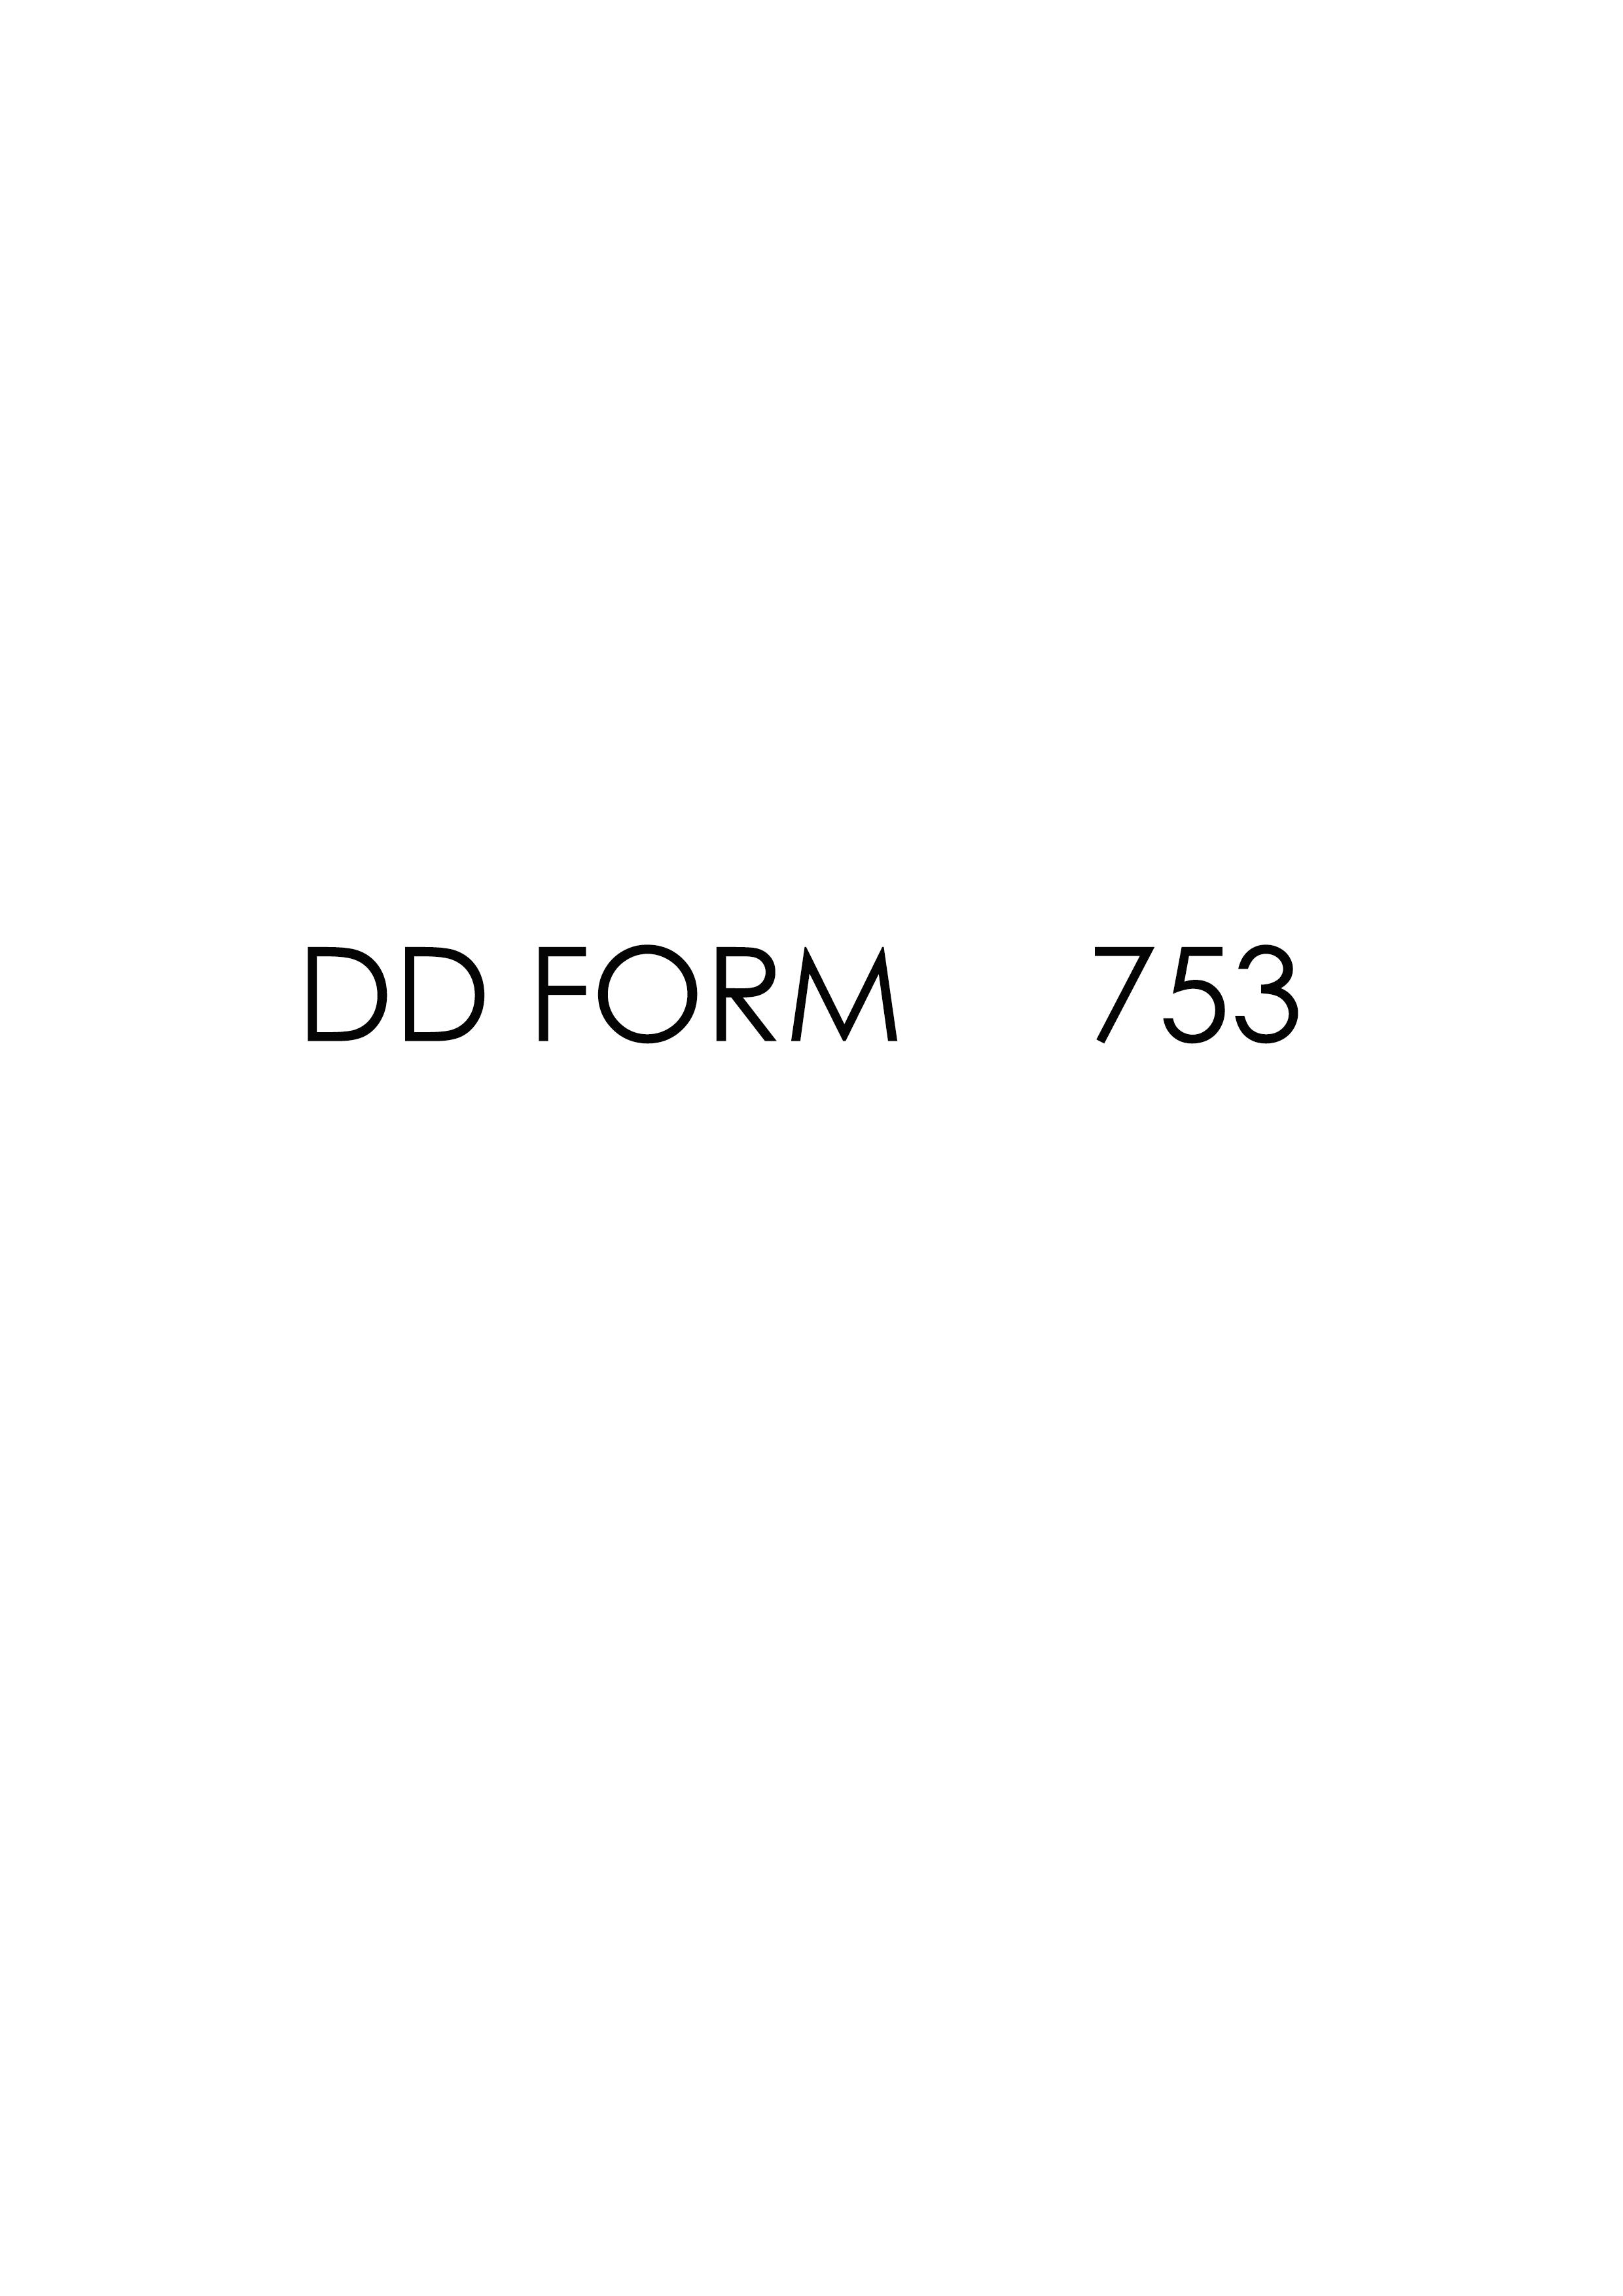 Download dd Form 753 Free